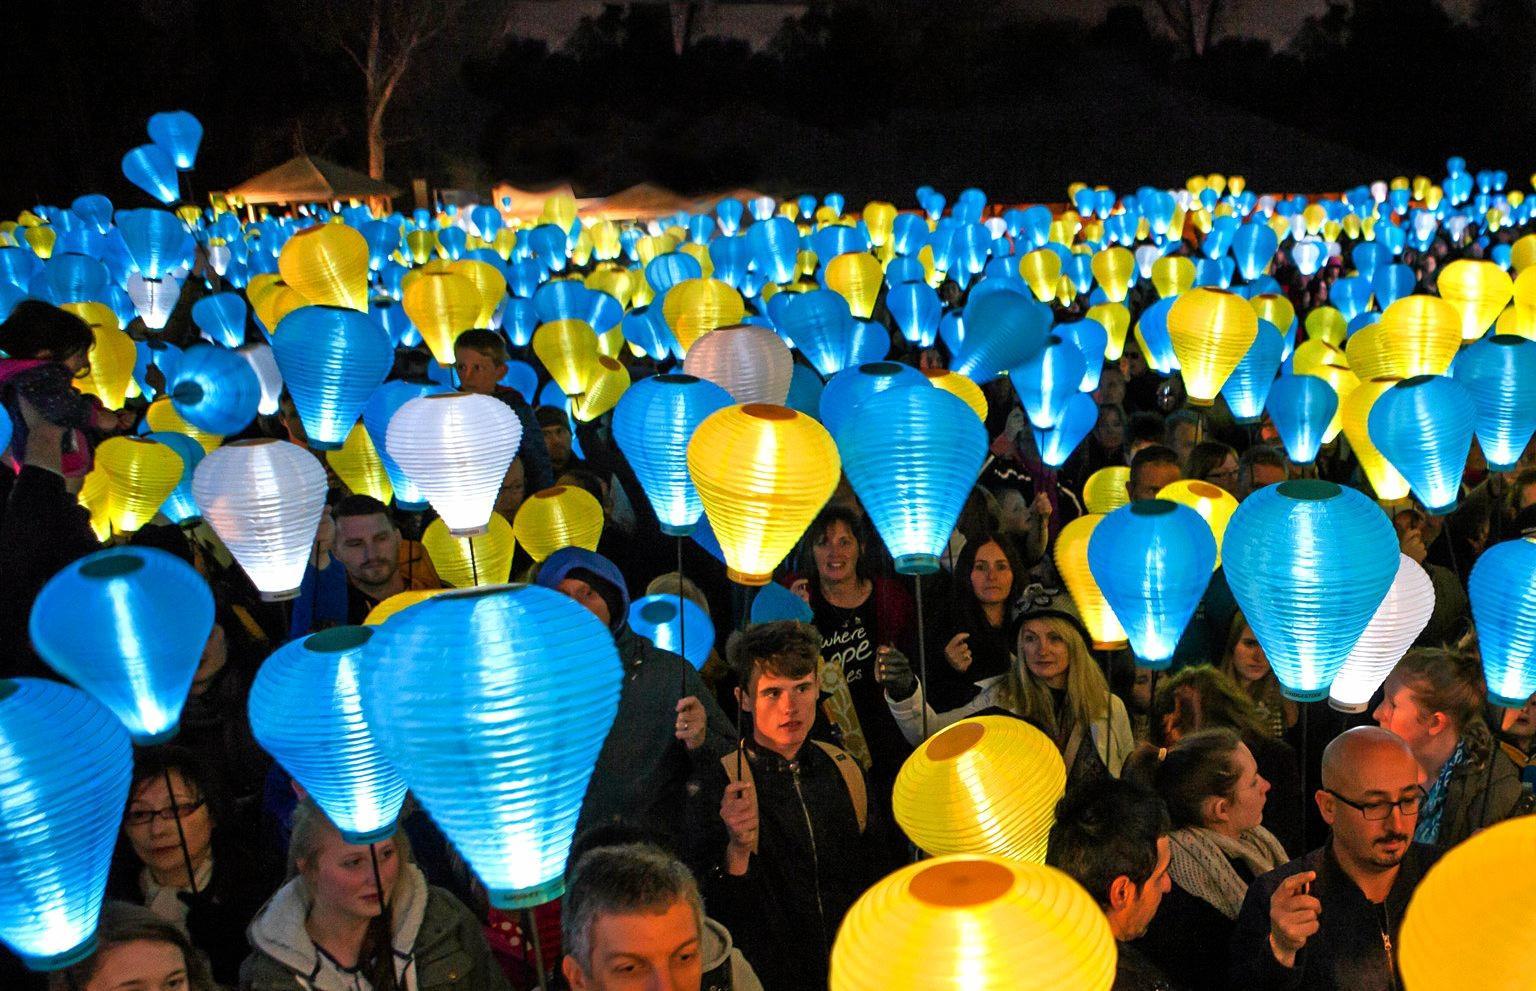 The Leukaemia Foundation will host its annual Light the Night lantern walk in Lismore on October 14.